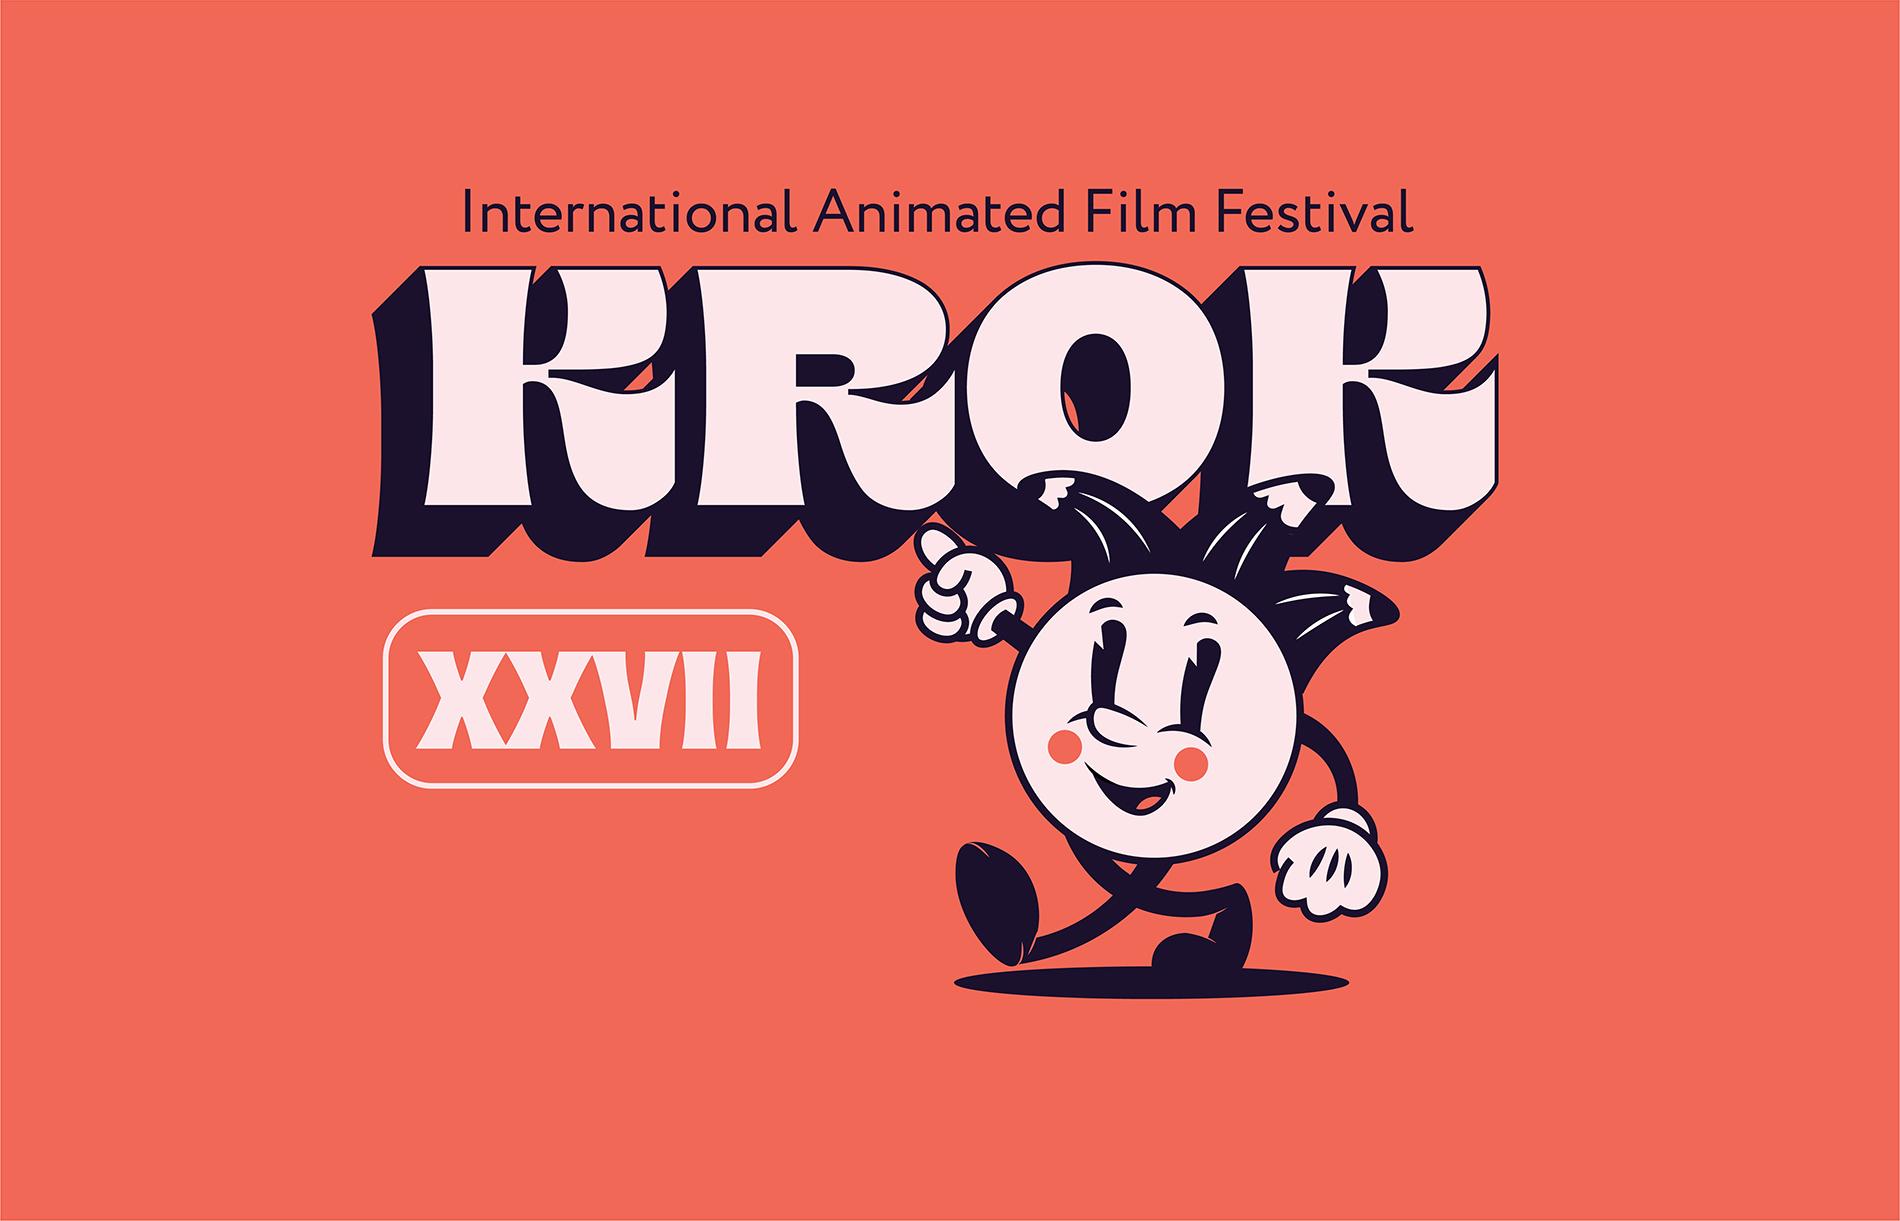 KROK Animated Film Festival Identity Designed by Karina Li